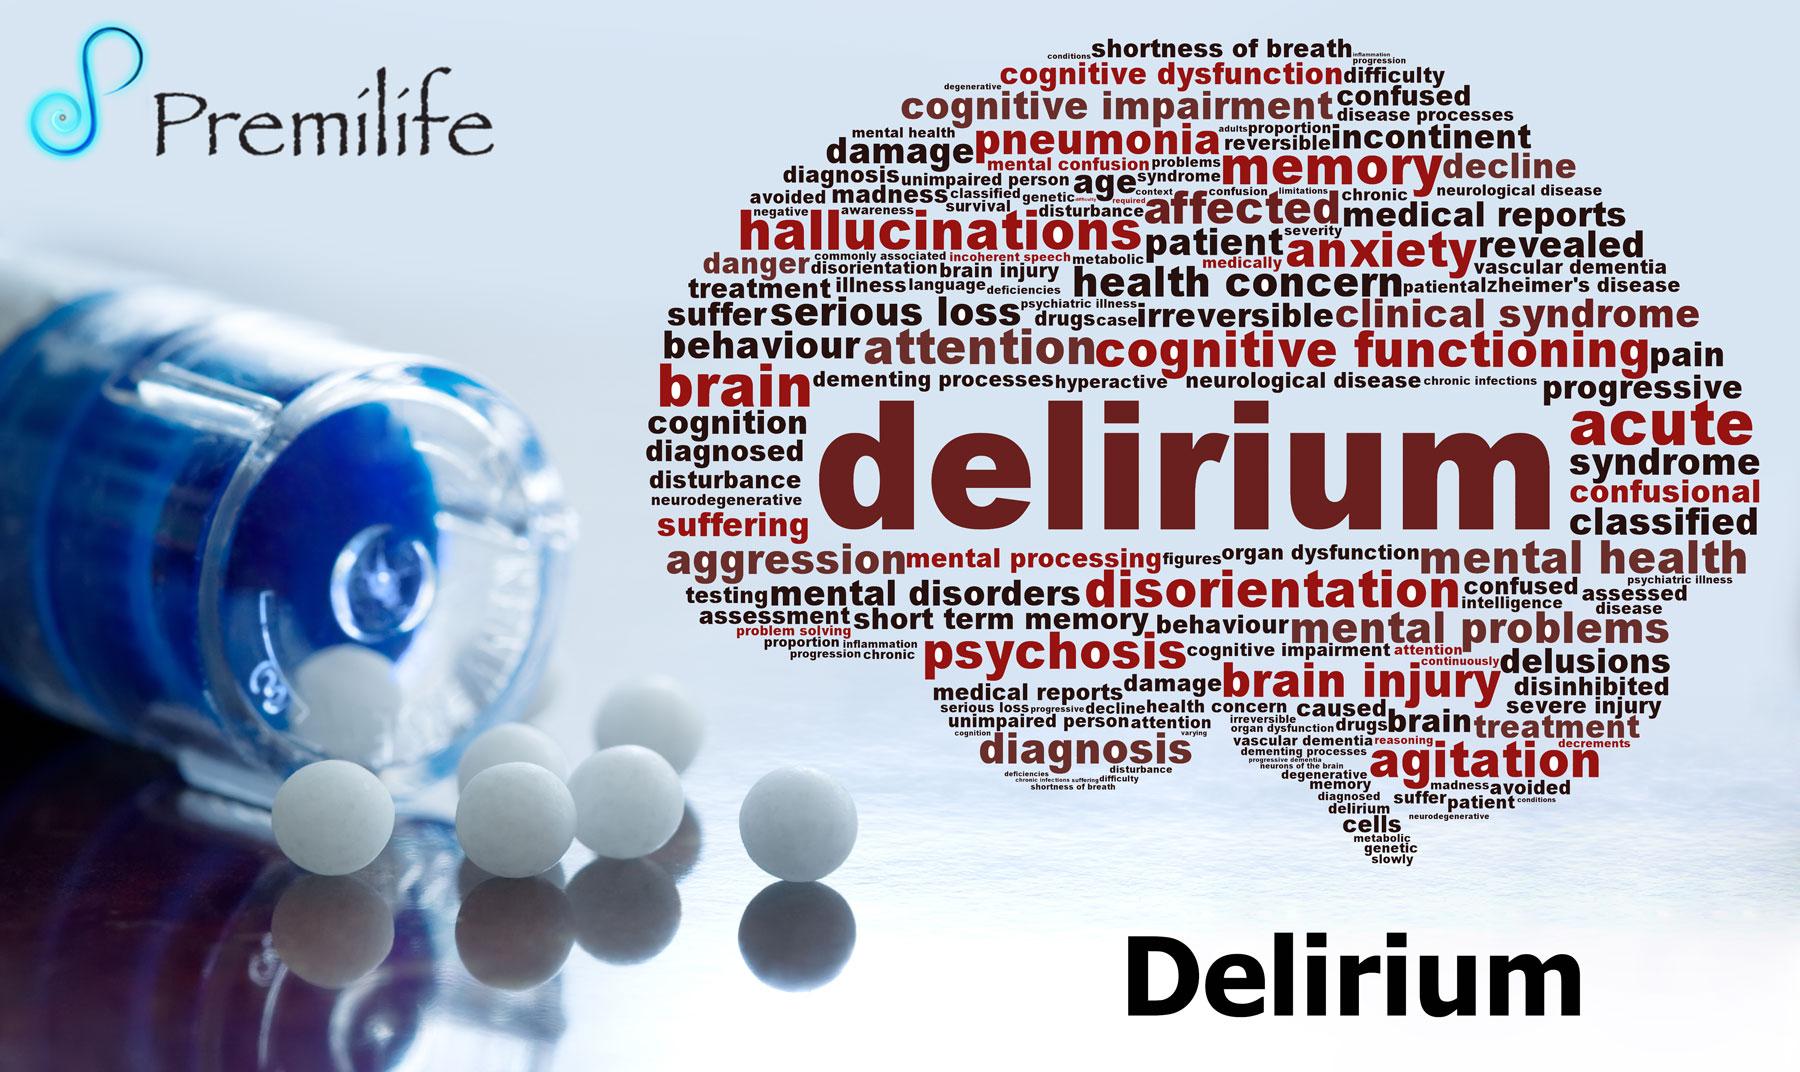 Delirium - Premilife - Homeopathic Remedies